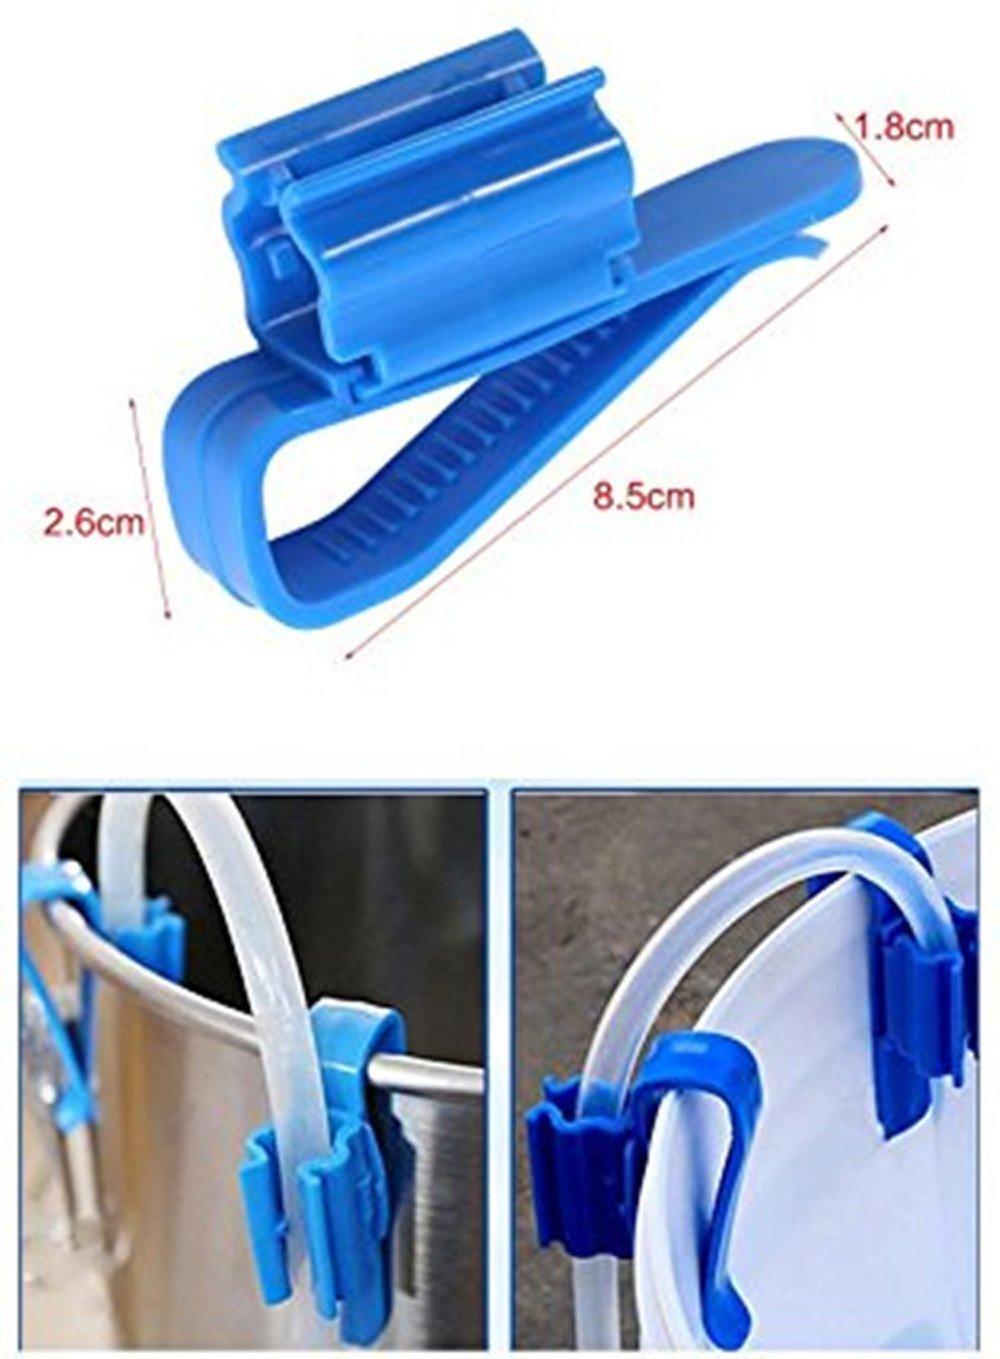 Malloom 2X Pl/ástico Acuario Tanque Tuber/ía de Agua Abrazadera Manguera Tubo Varilla Clip de fijaci/ón Montaje Holde Acuario Filtro Cubo Cubo Tubo